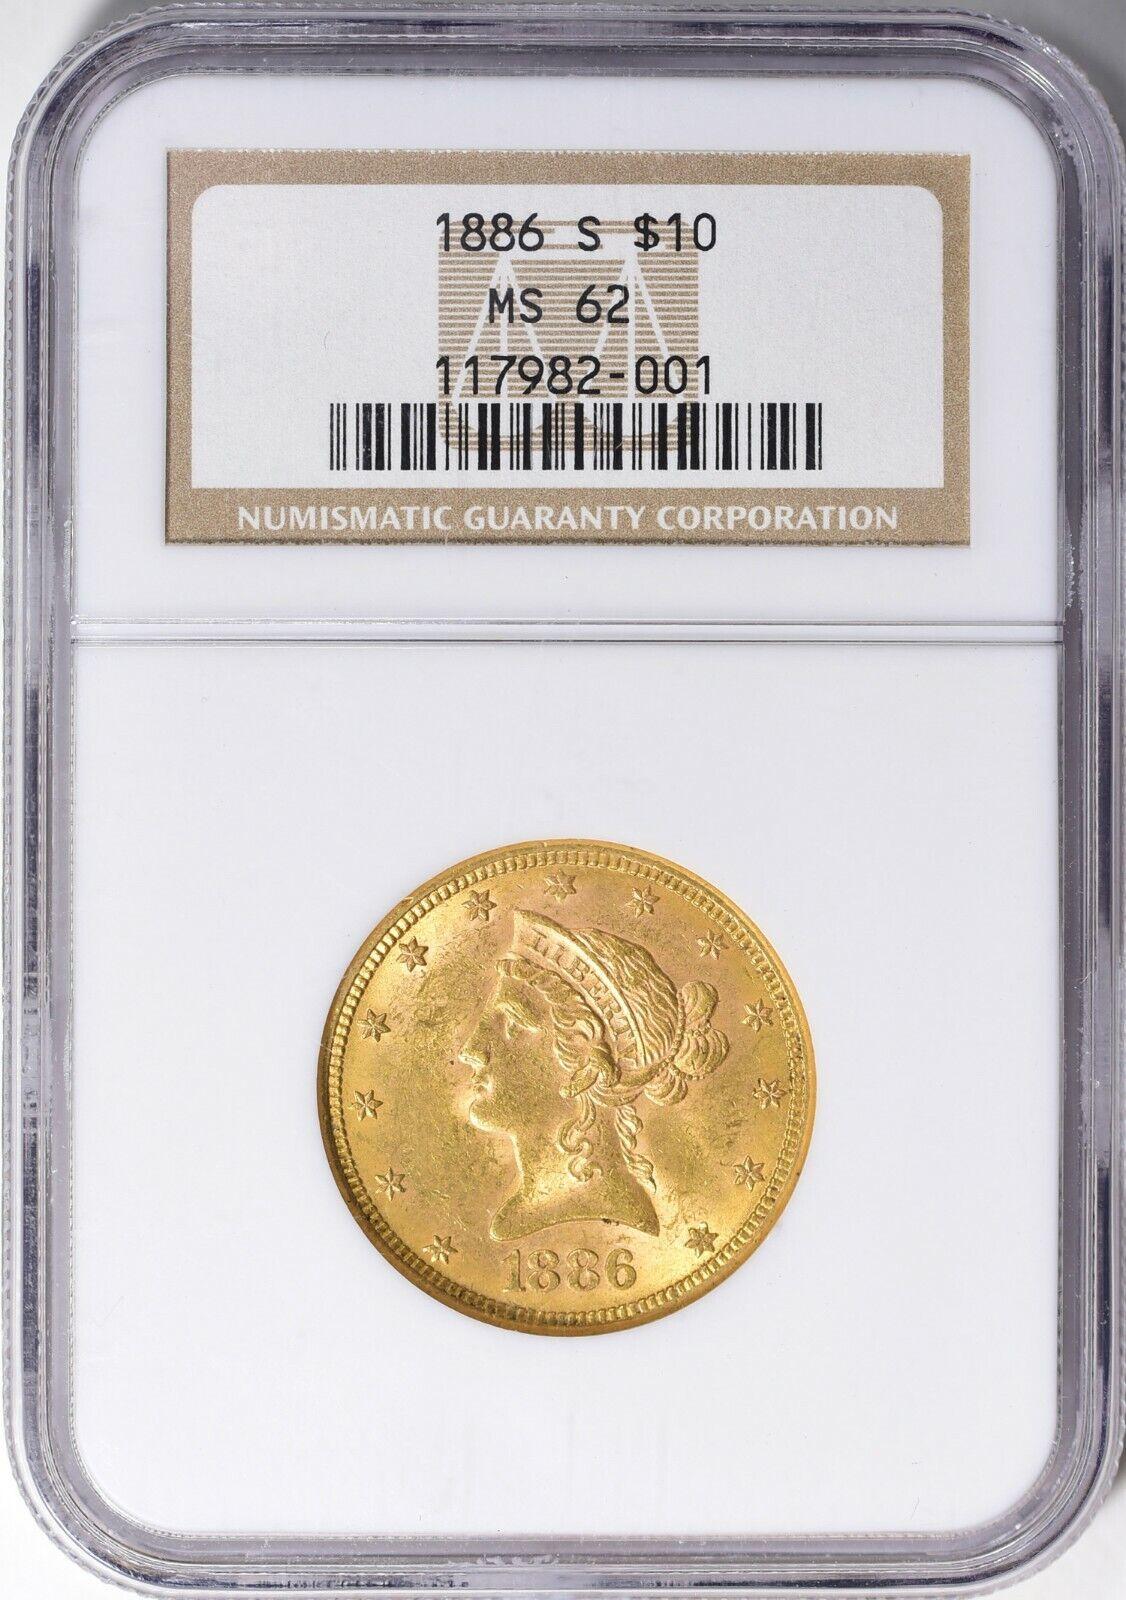 1886-S LIBERTY HEAD EAGLE $10 GOLD NGC MS62